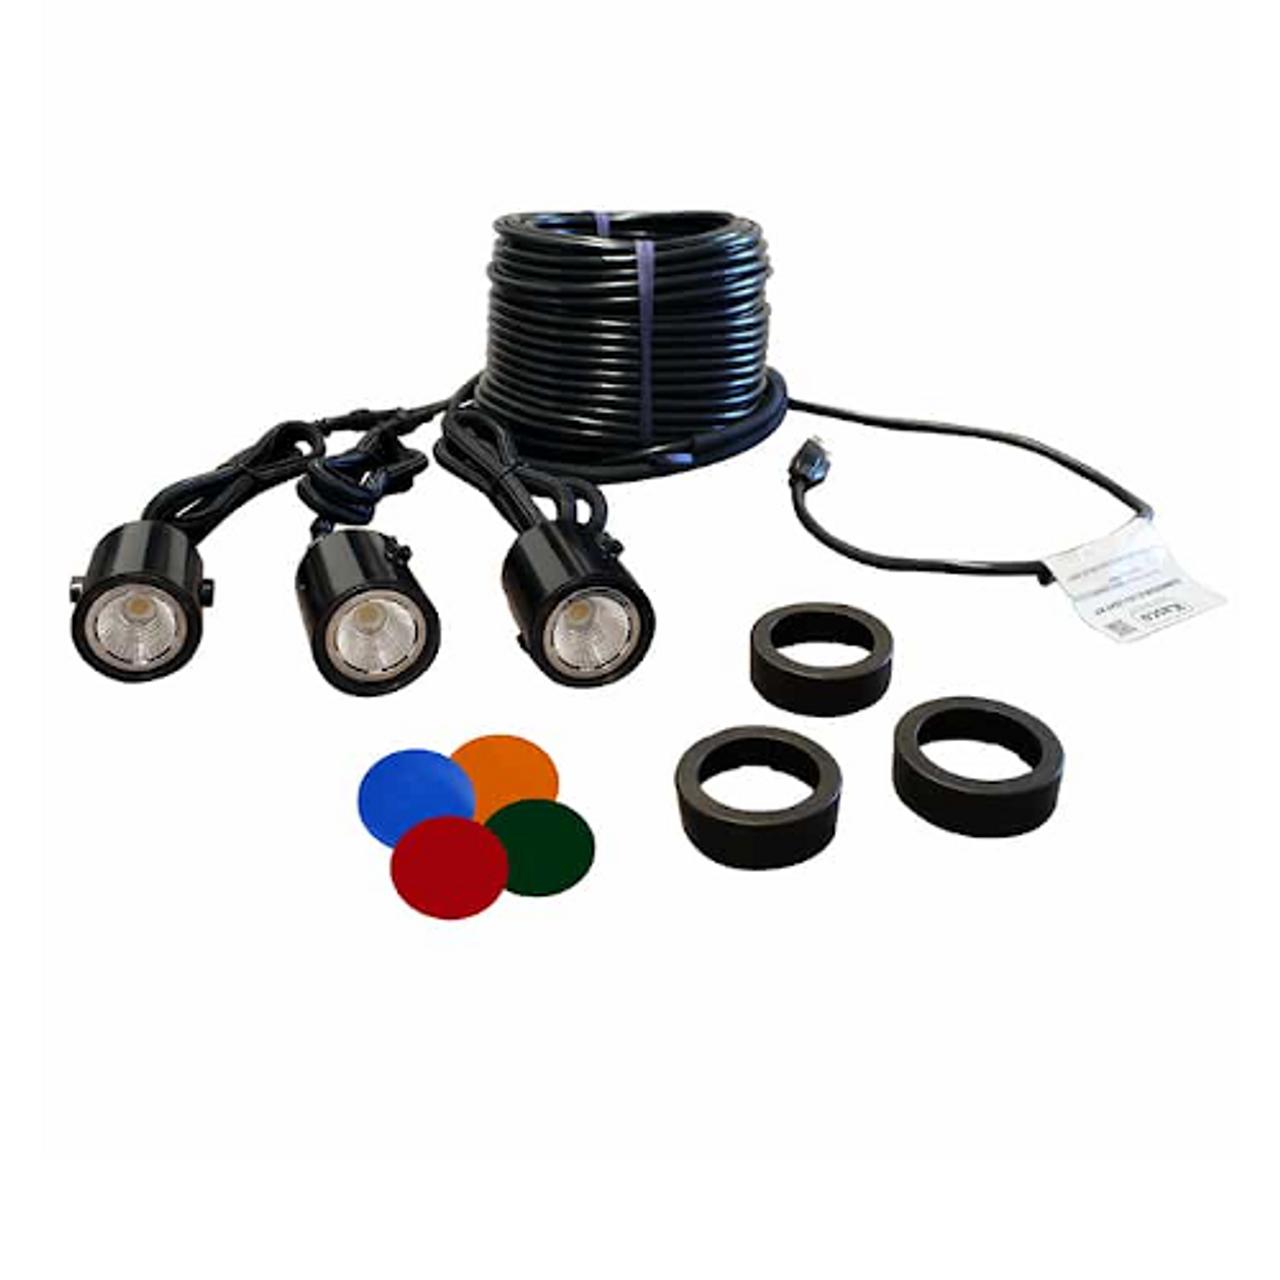 Kasco Composite LED 3 light set